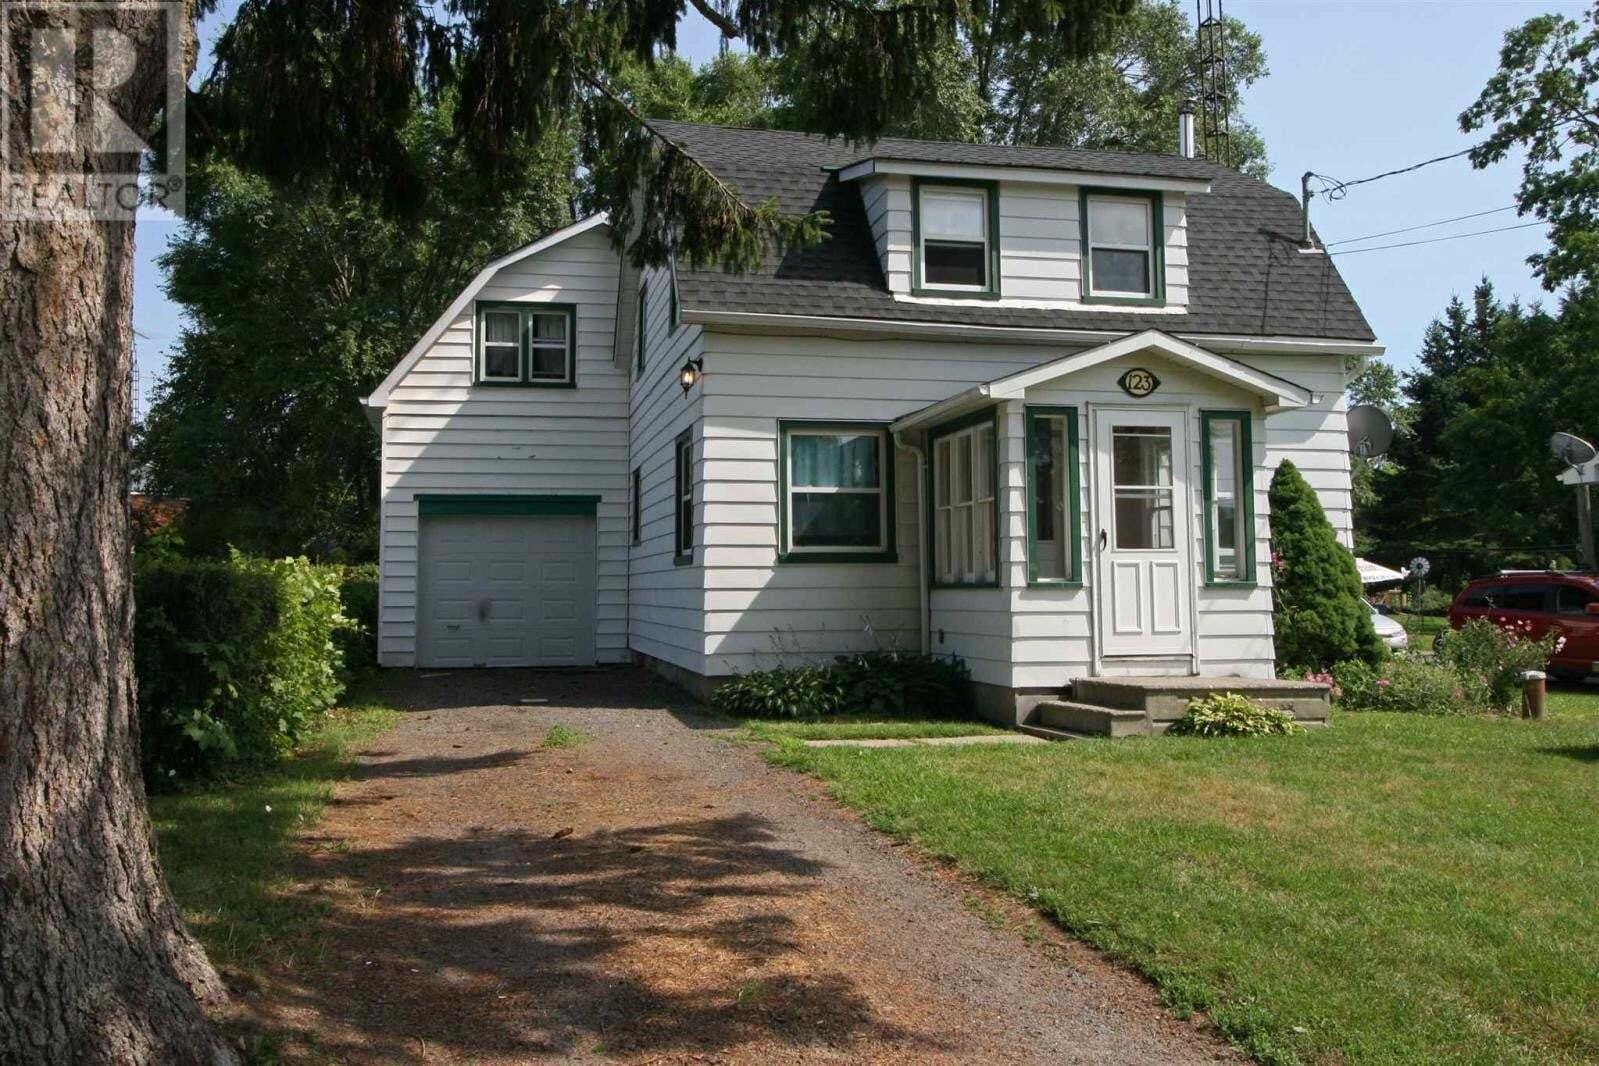 House for sale at 123 Hellen St Seeleys Bay Ontario - MLS: K20004100